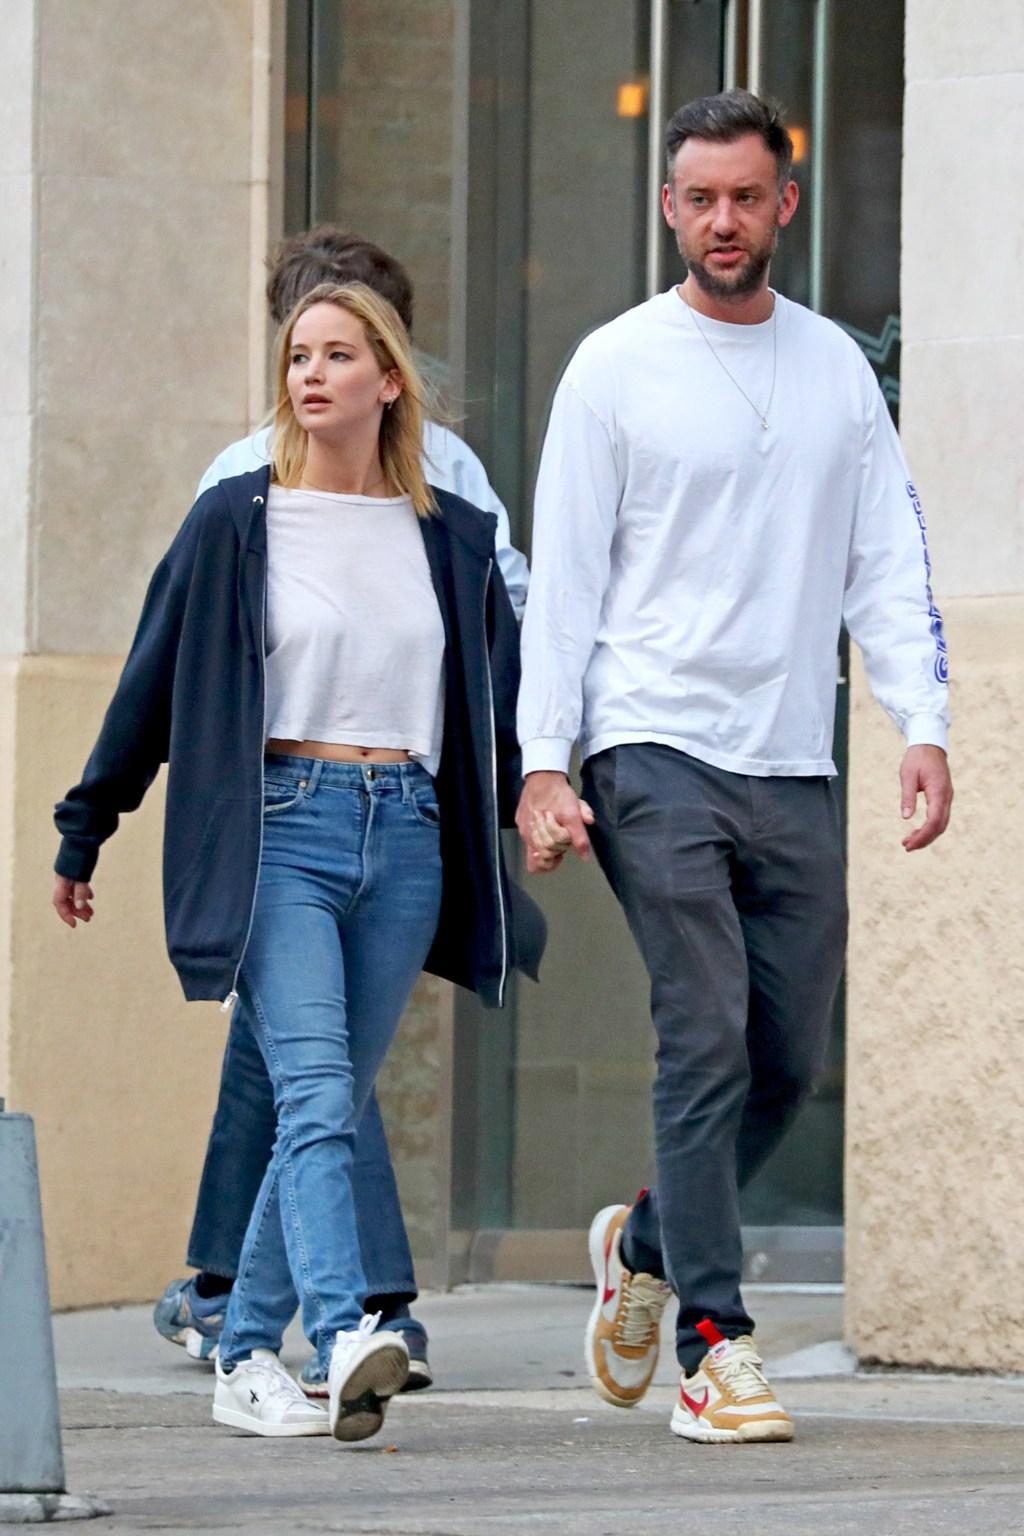 Jennifer Lawrence, fiance Cooke Maroney